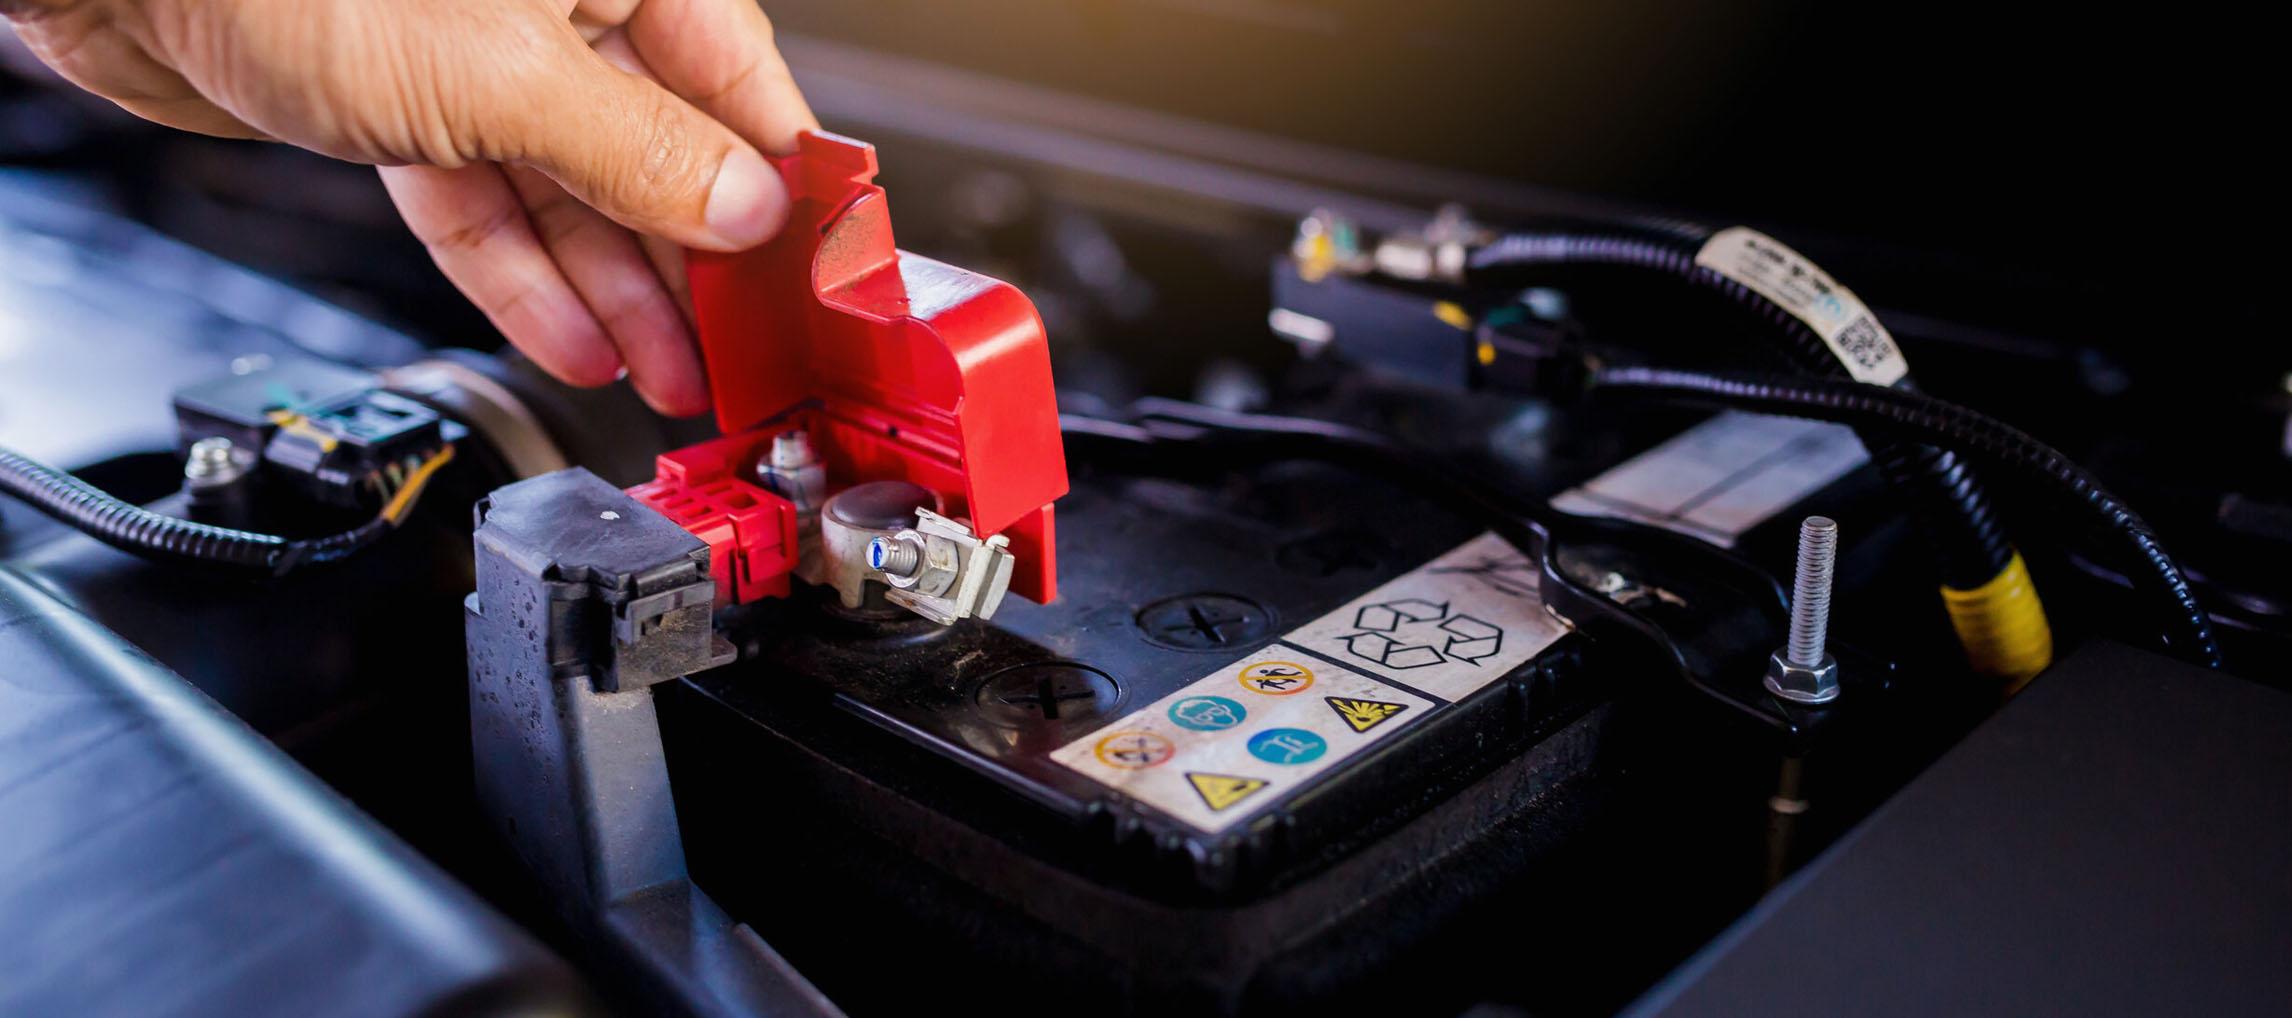 Сел аккумулятор в машине